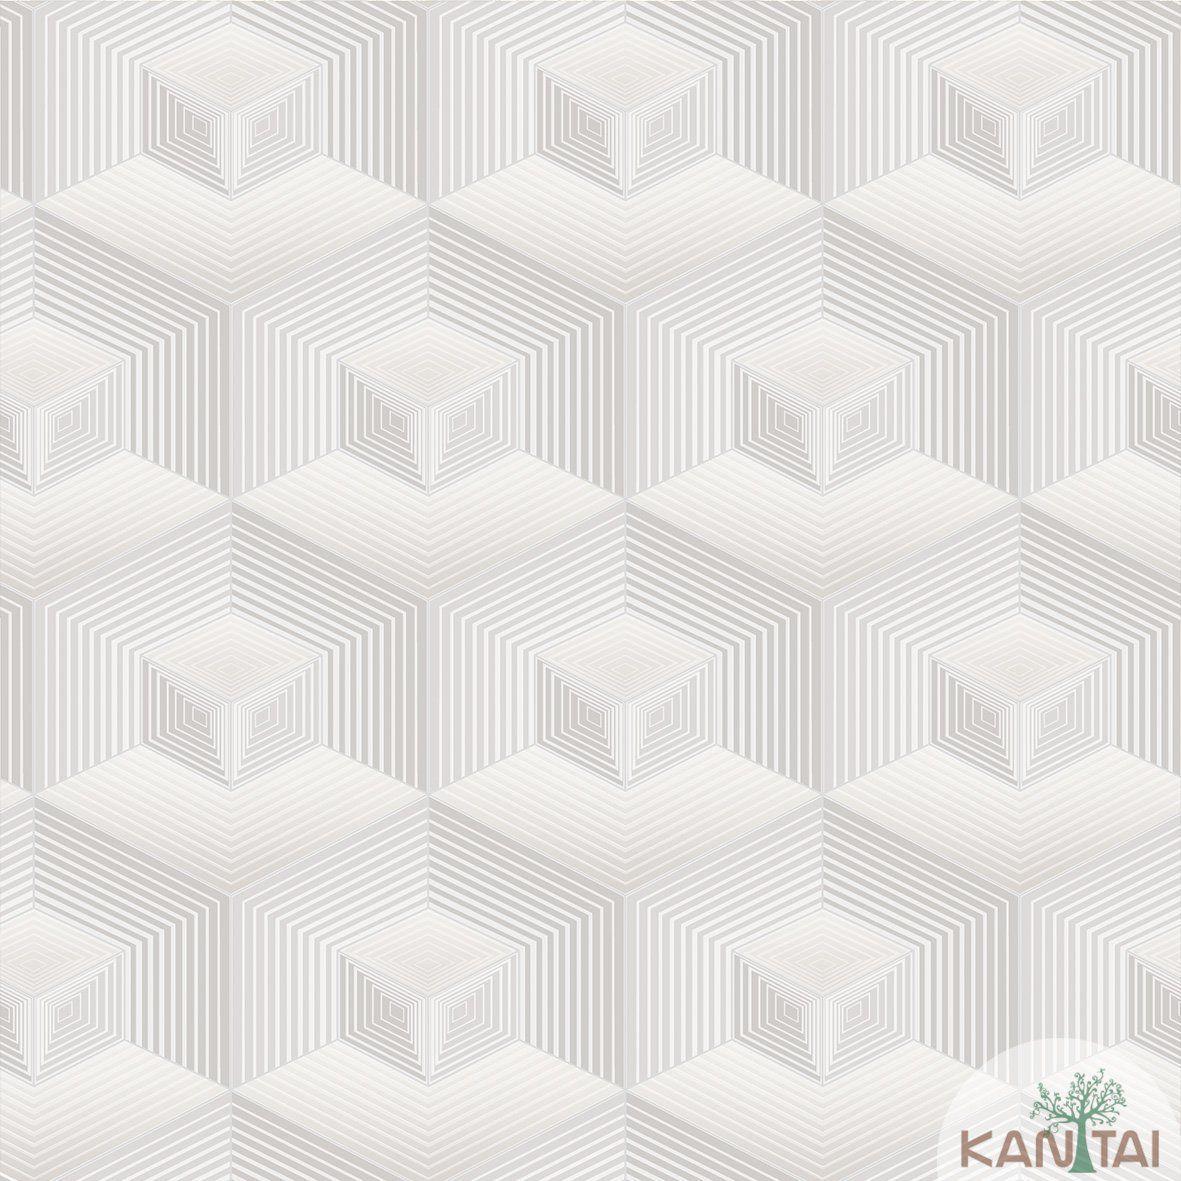 Papel de Parede Kan Tai Vinilico  Coleção Neonature III 3D Geométrico Cinza, Marrom Claro